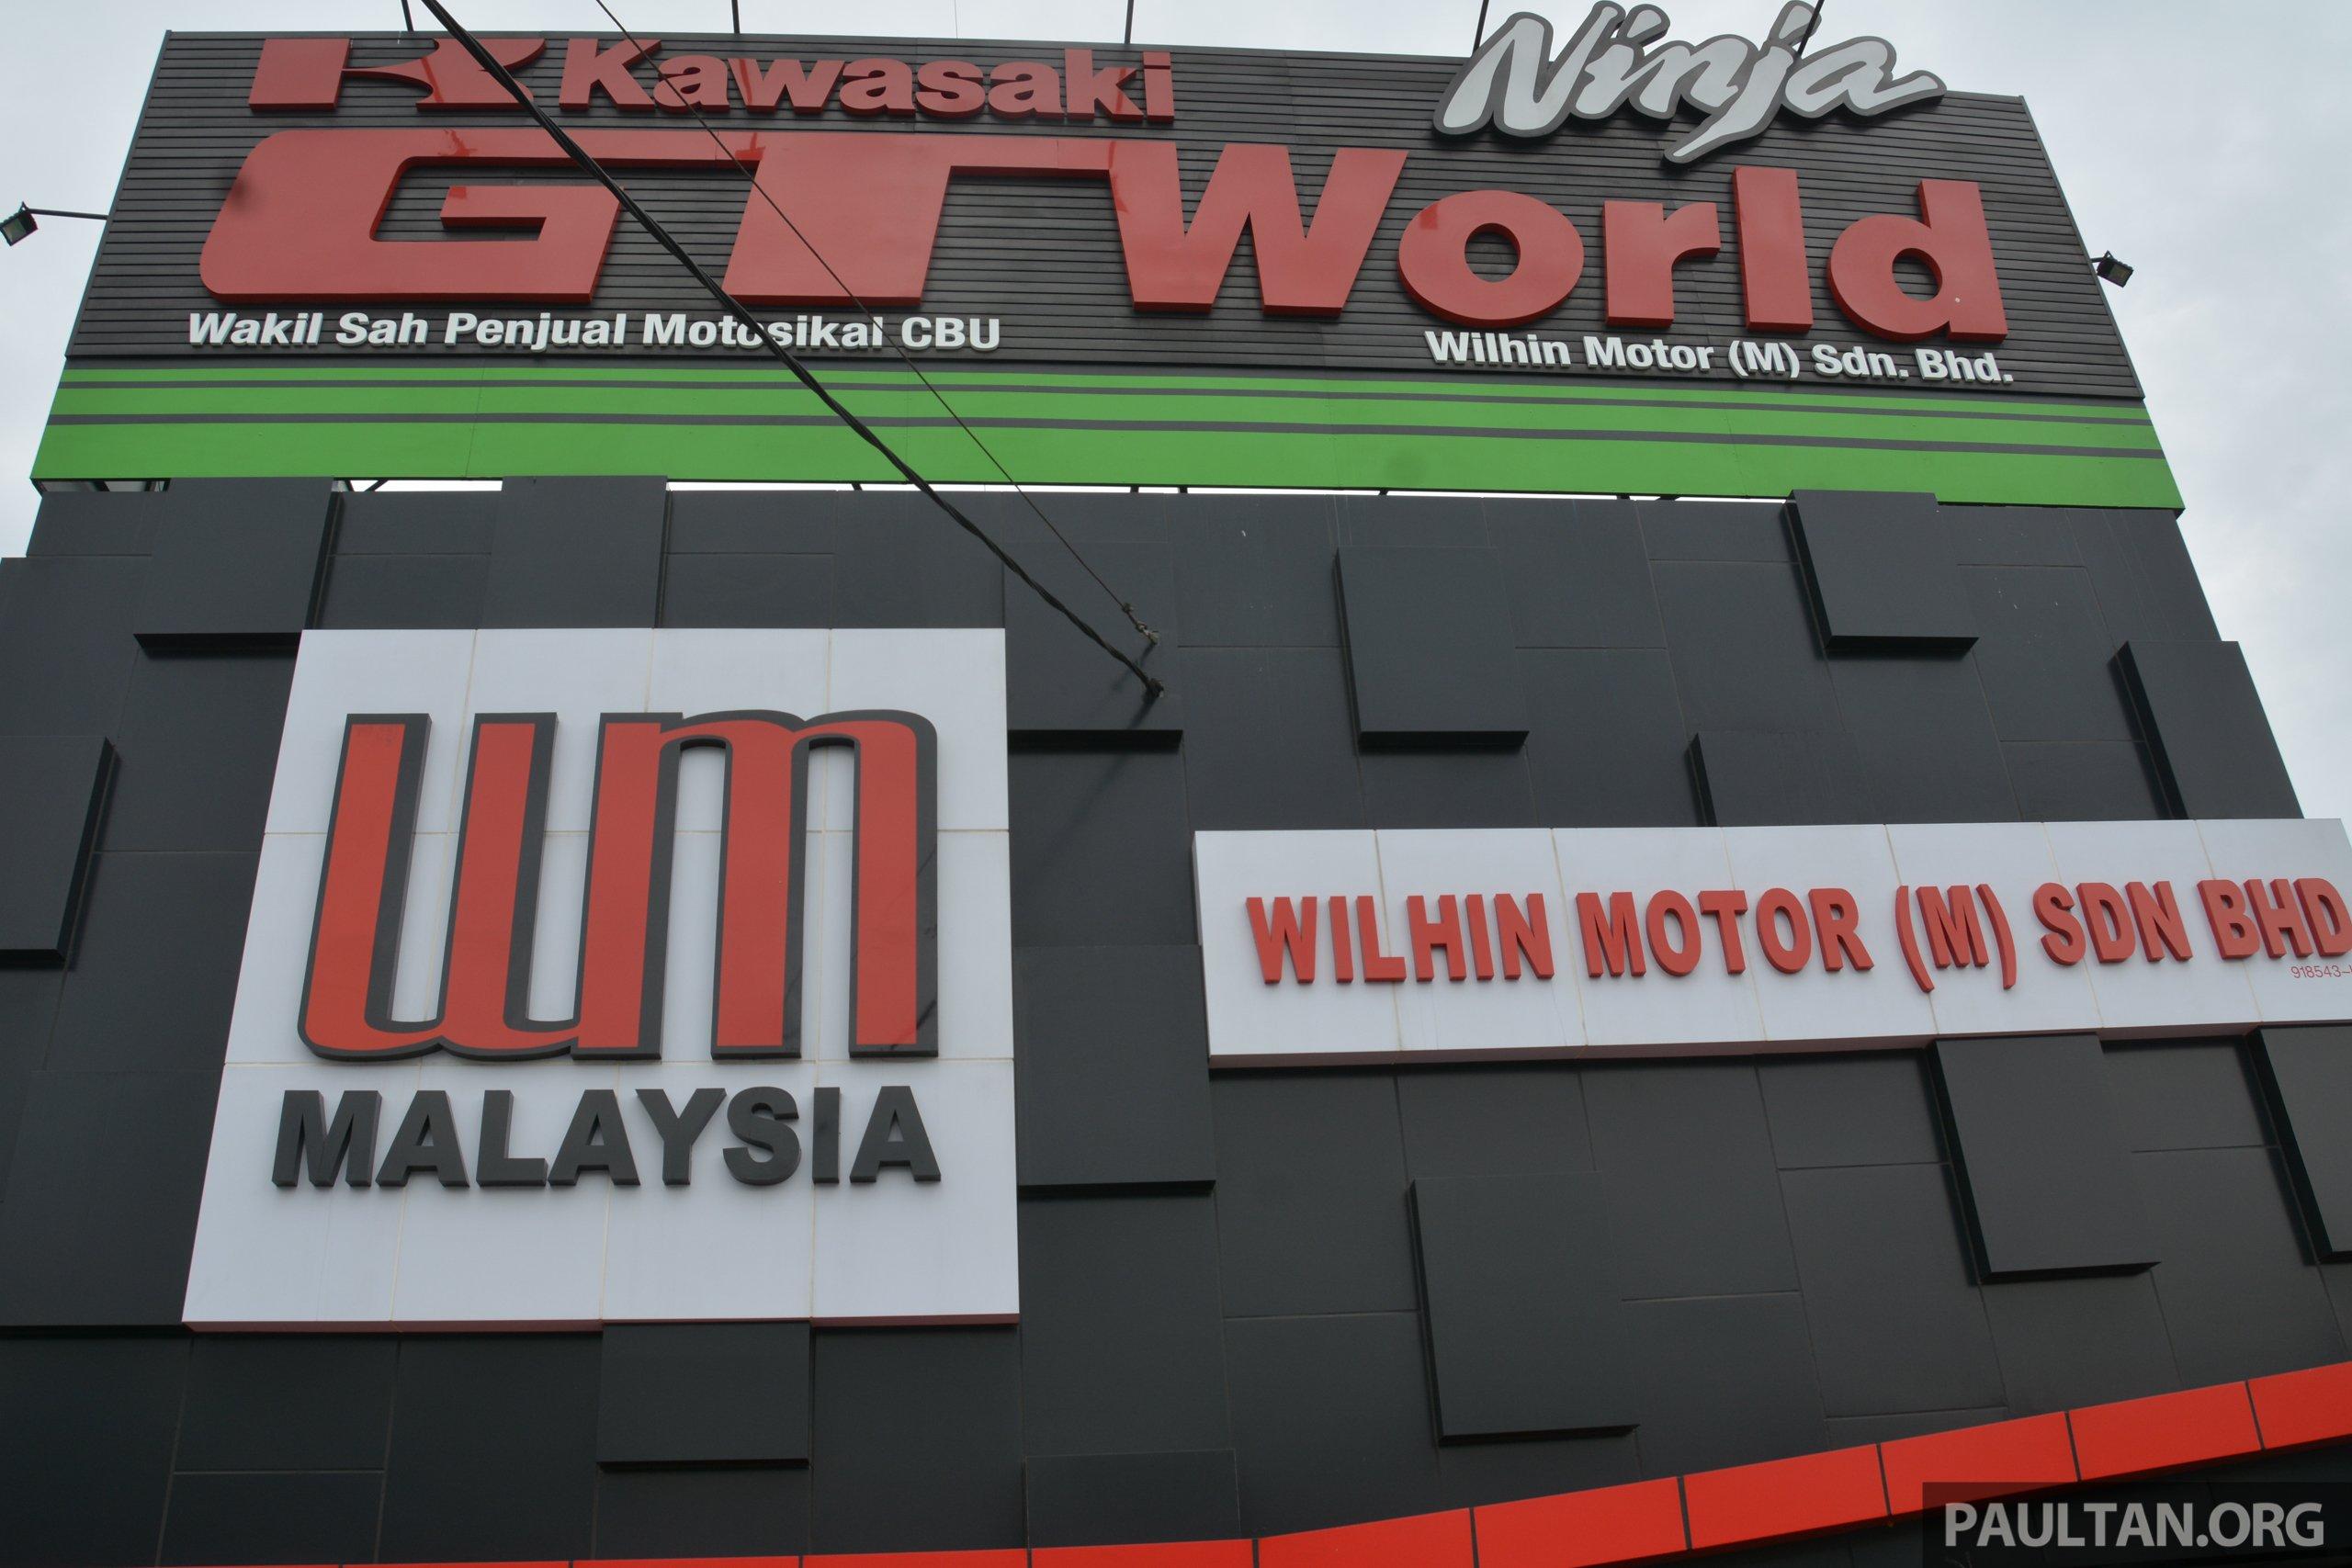 Kawasaki Gt World Ninja Showroom And Service Centre Opens At Wilhin Motor In Balakong Selangor Paultan Org